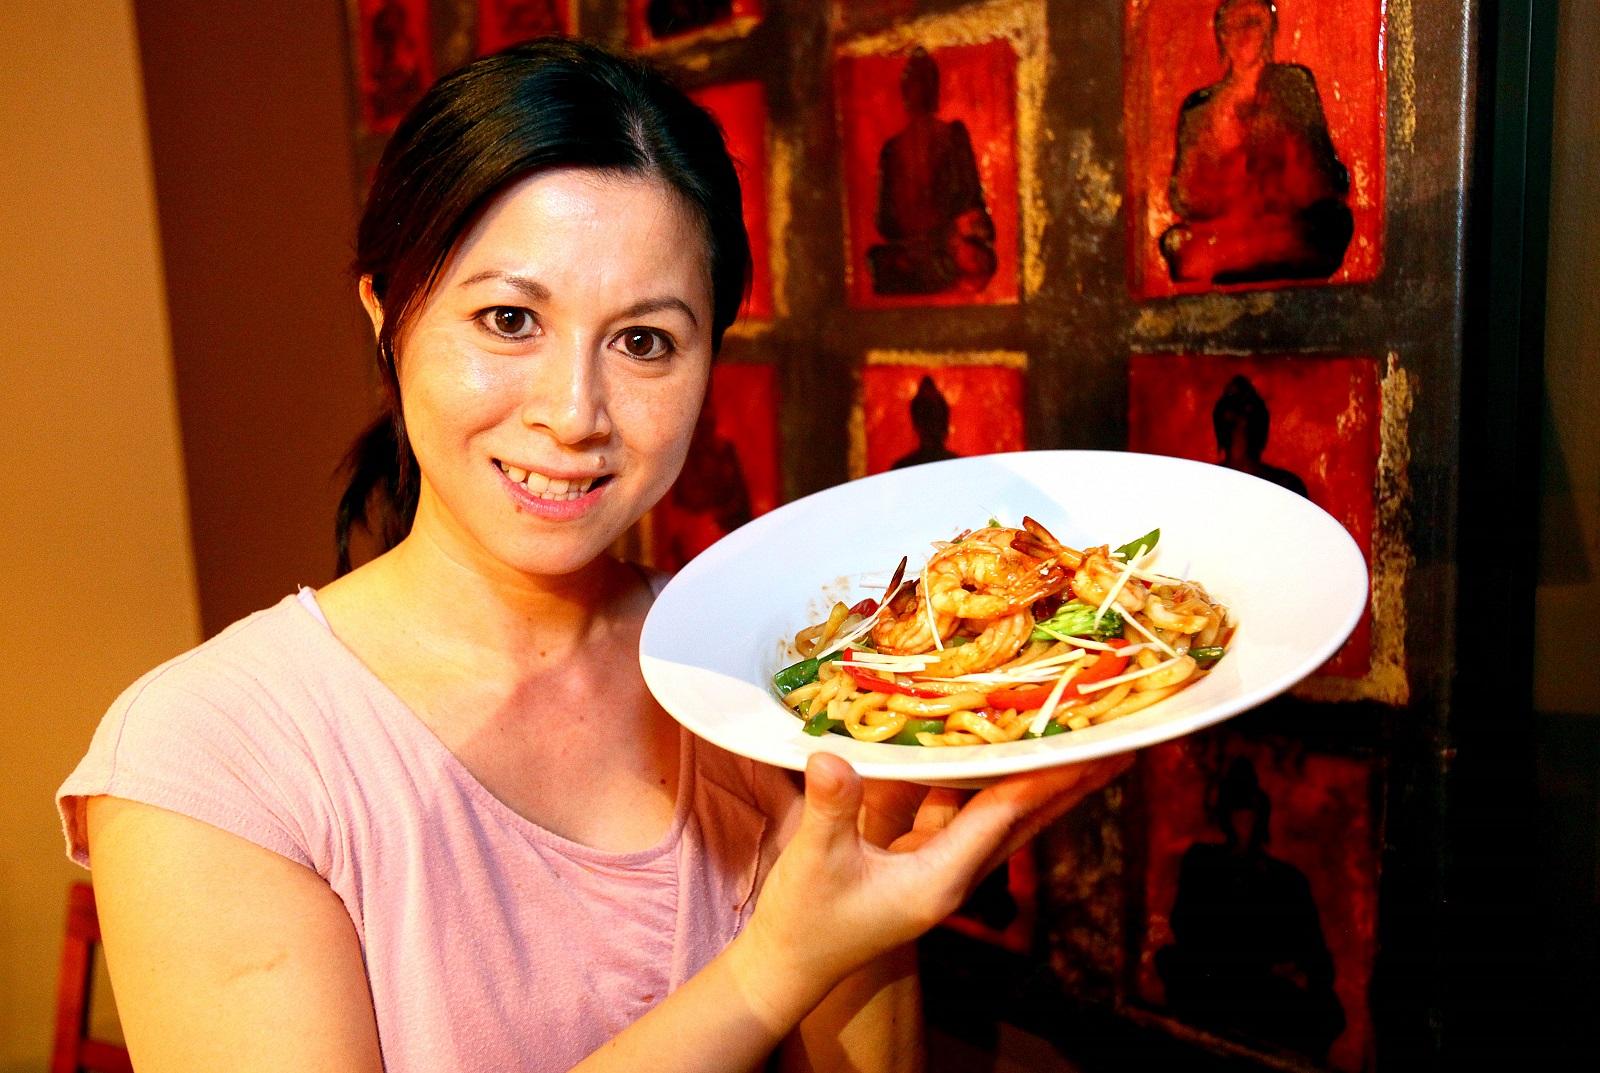 Saigon Bangkok's Anna Truong with basil shrimp udon at said restaurant on Niagara Falls Boulevard in the Town of Tonawanda. (Robert Kirkham/Buffalo News)